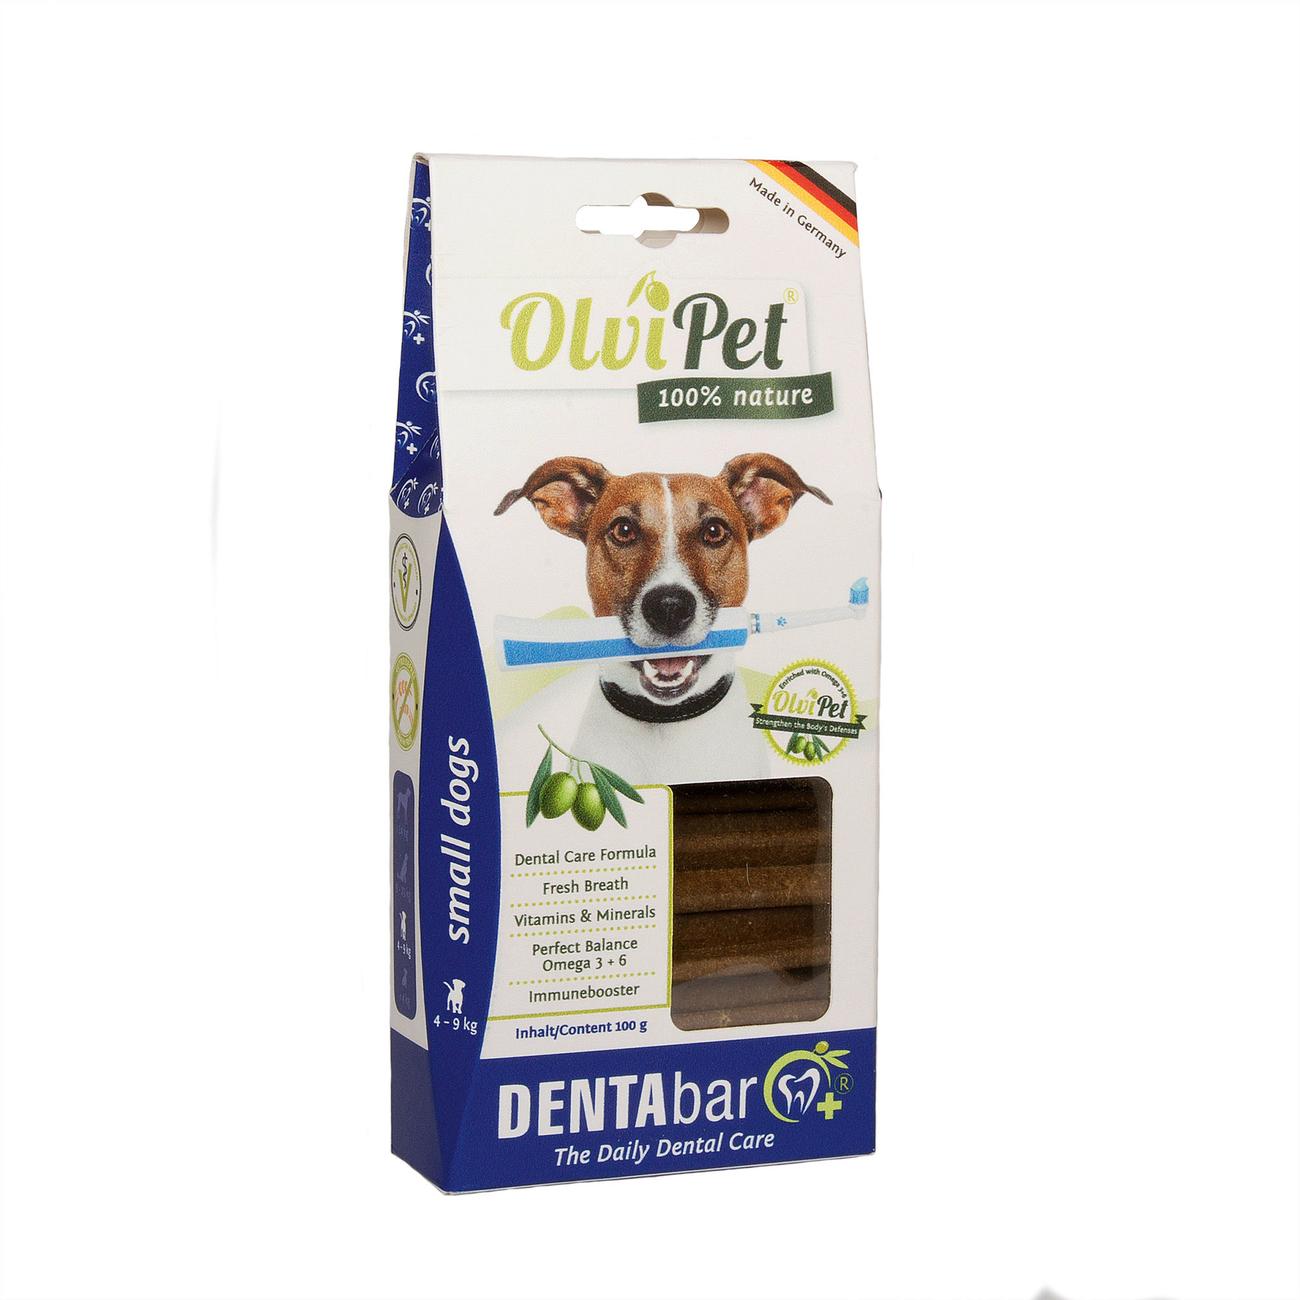 OlviPet DentaBar für Hunde, Bild 4